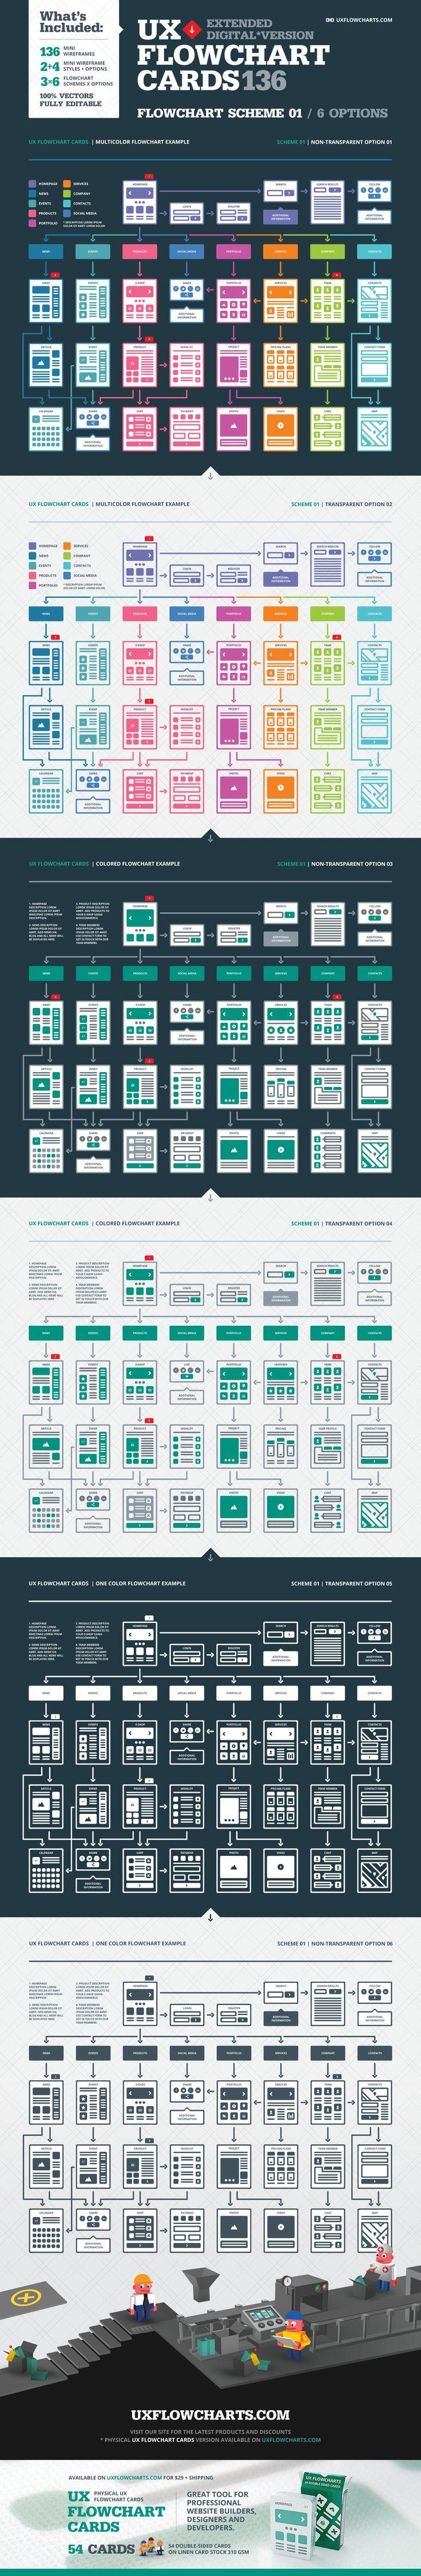 UX Flowchart Cards | AI Version by UX Flowcharts on Creative Market